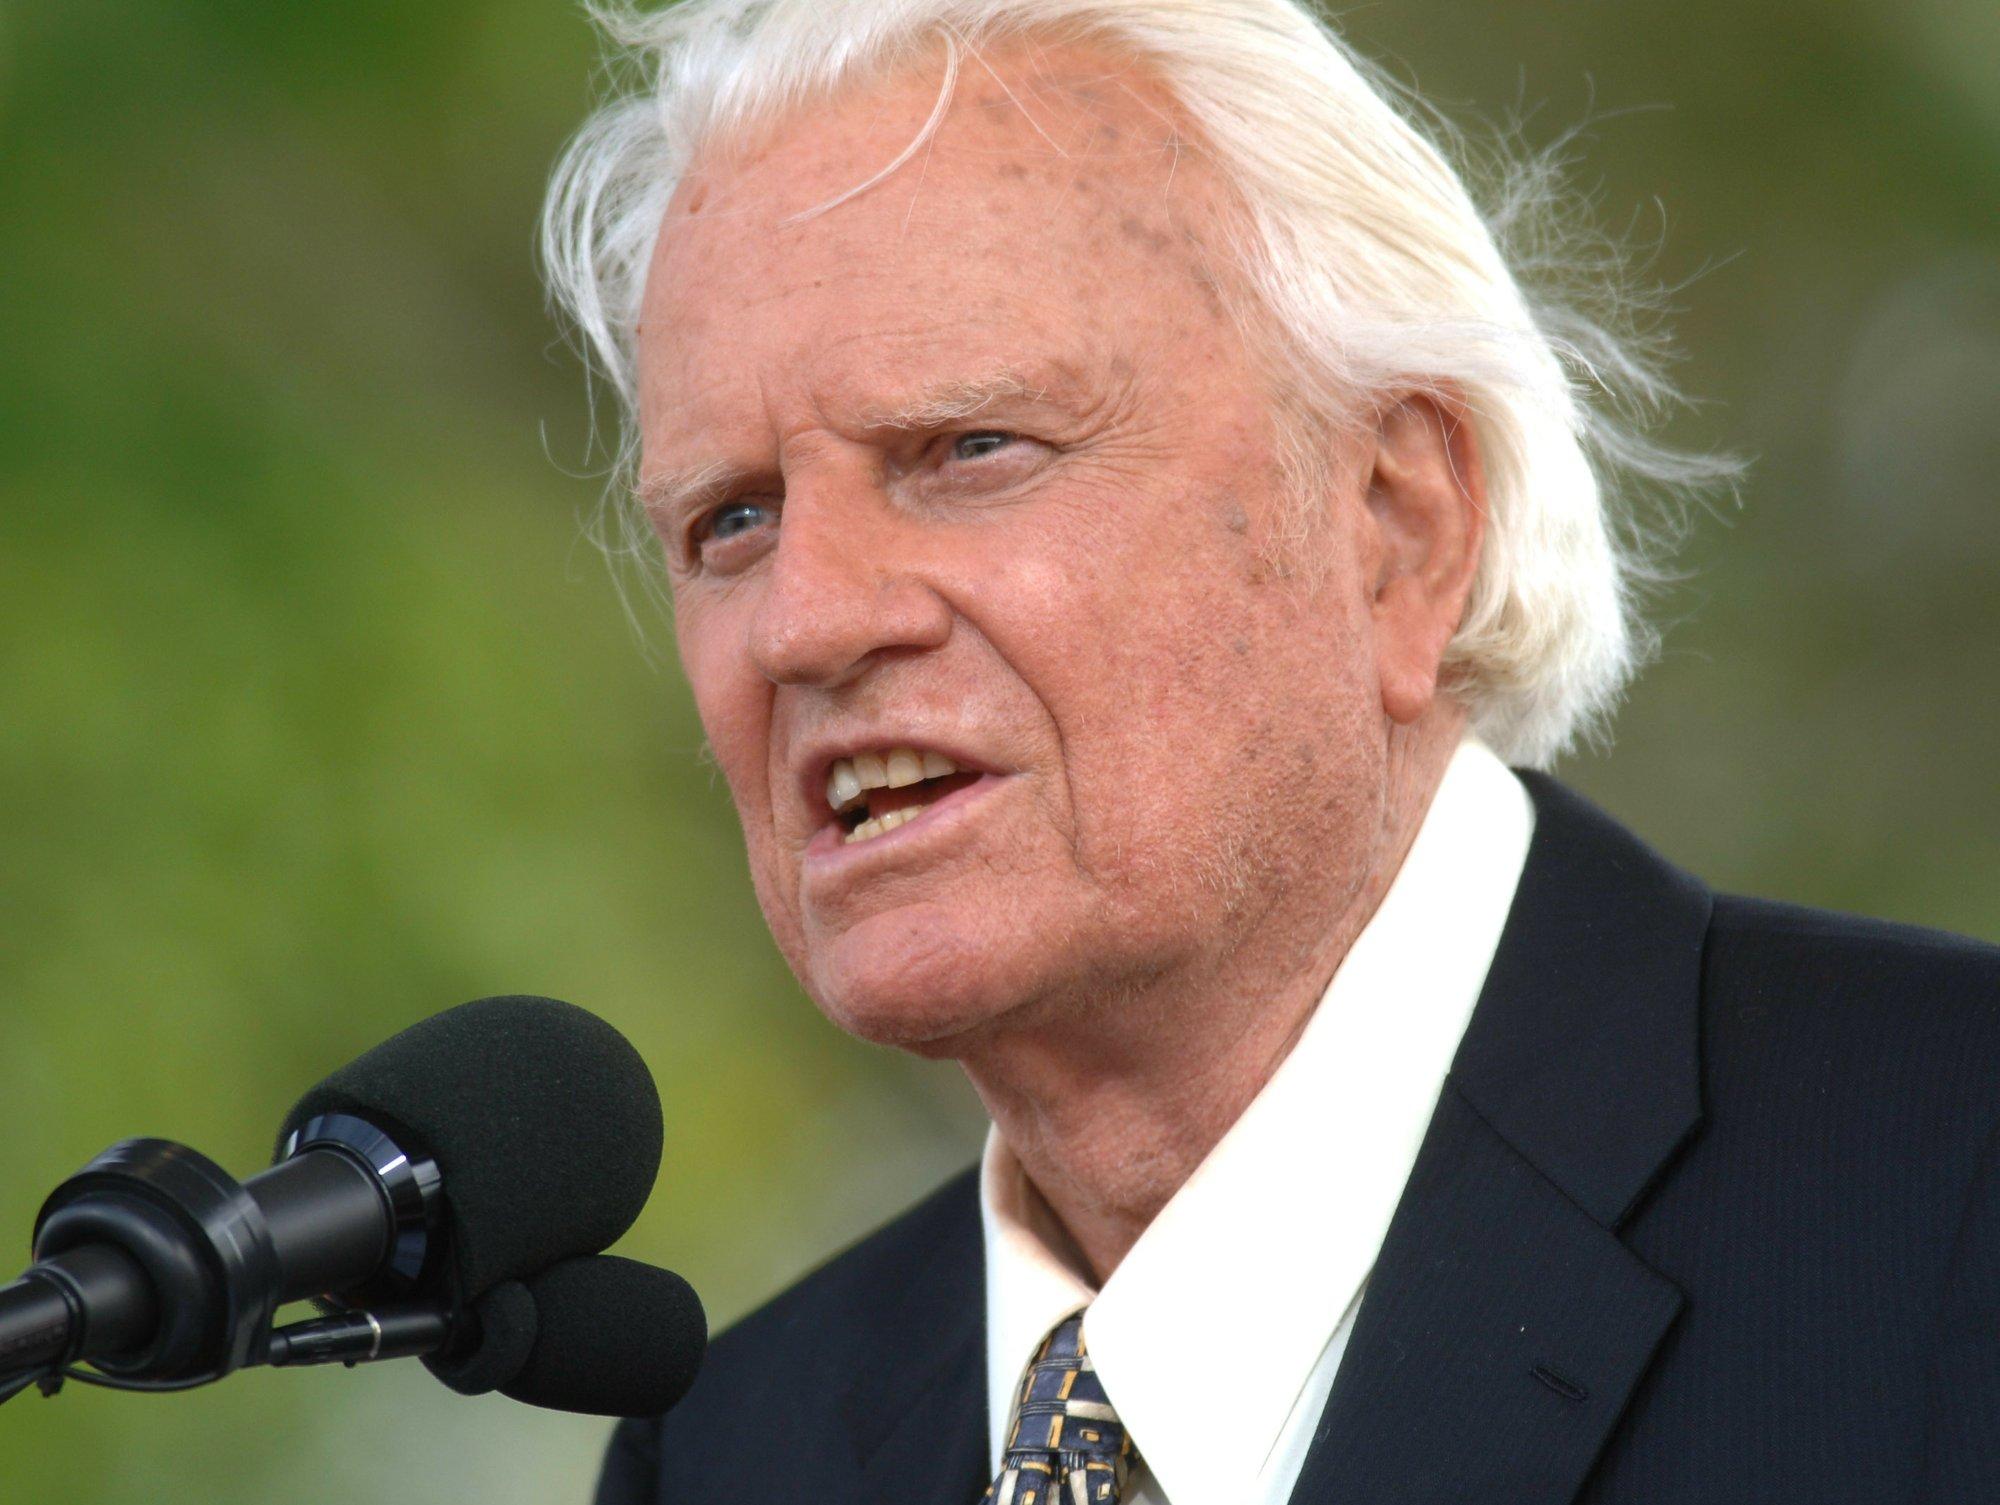 Rev  Billy Graham, known as 'America's Pastor,' dies at 99